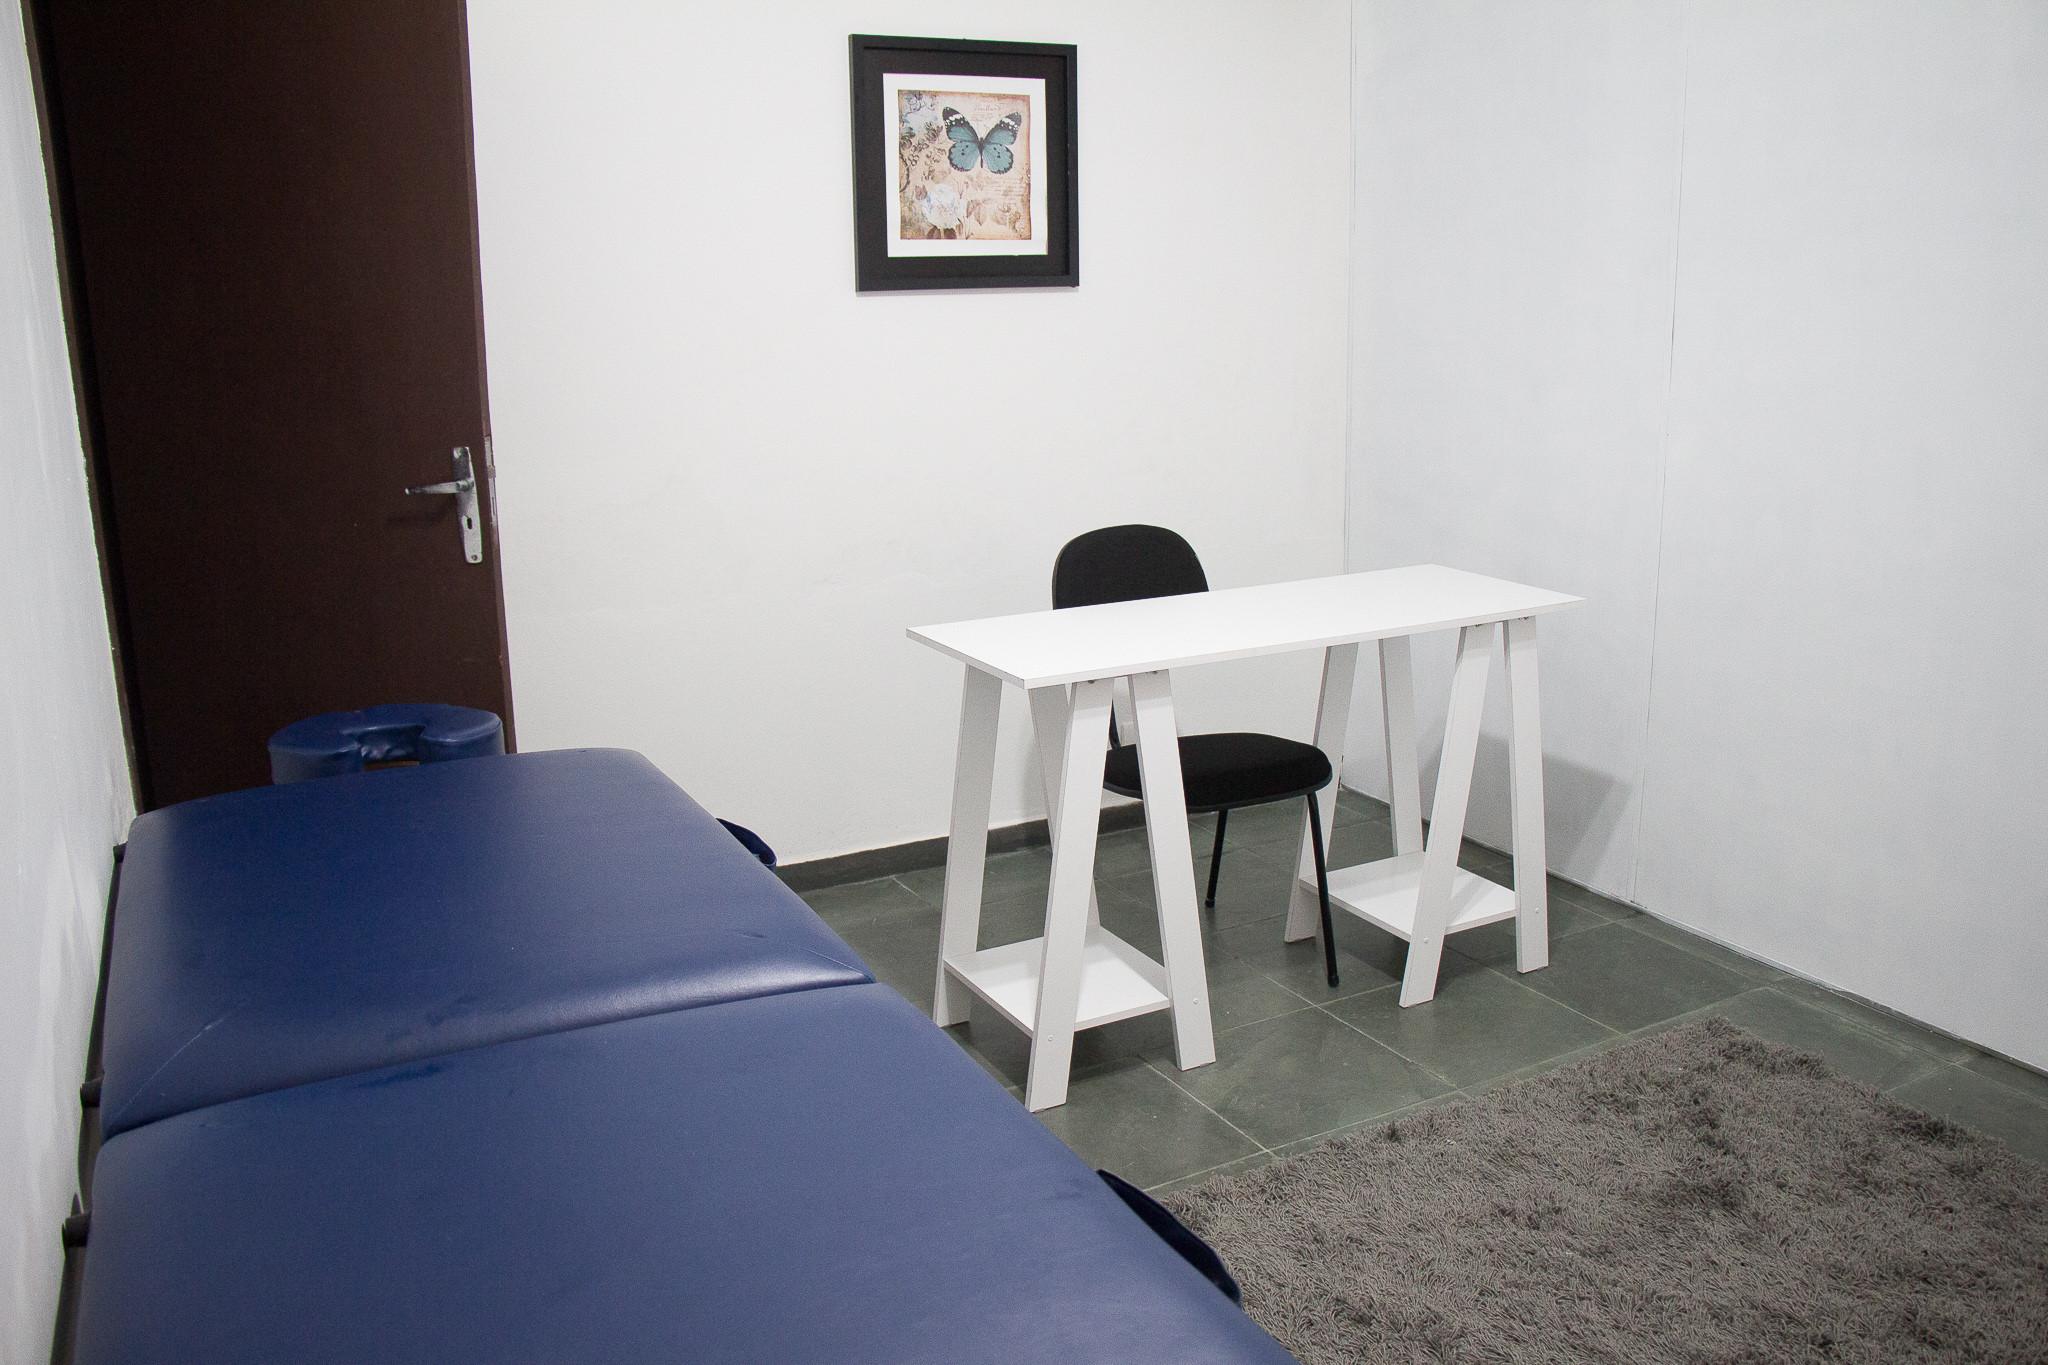 Sala 6 - Terapias holísticas